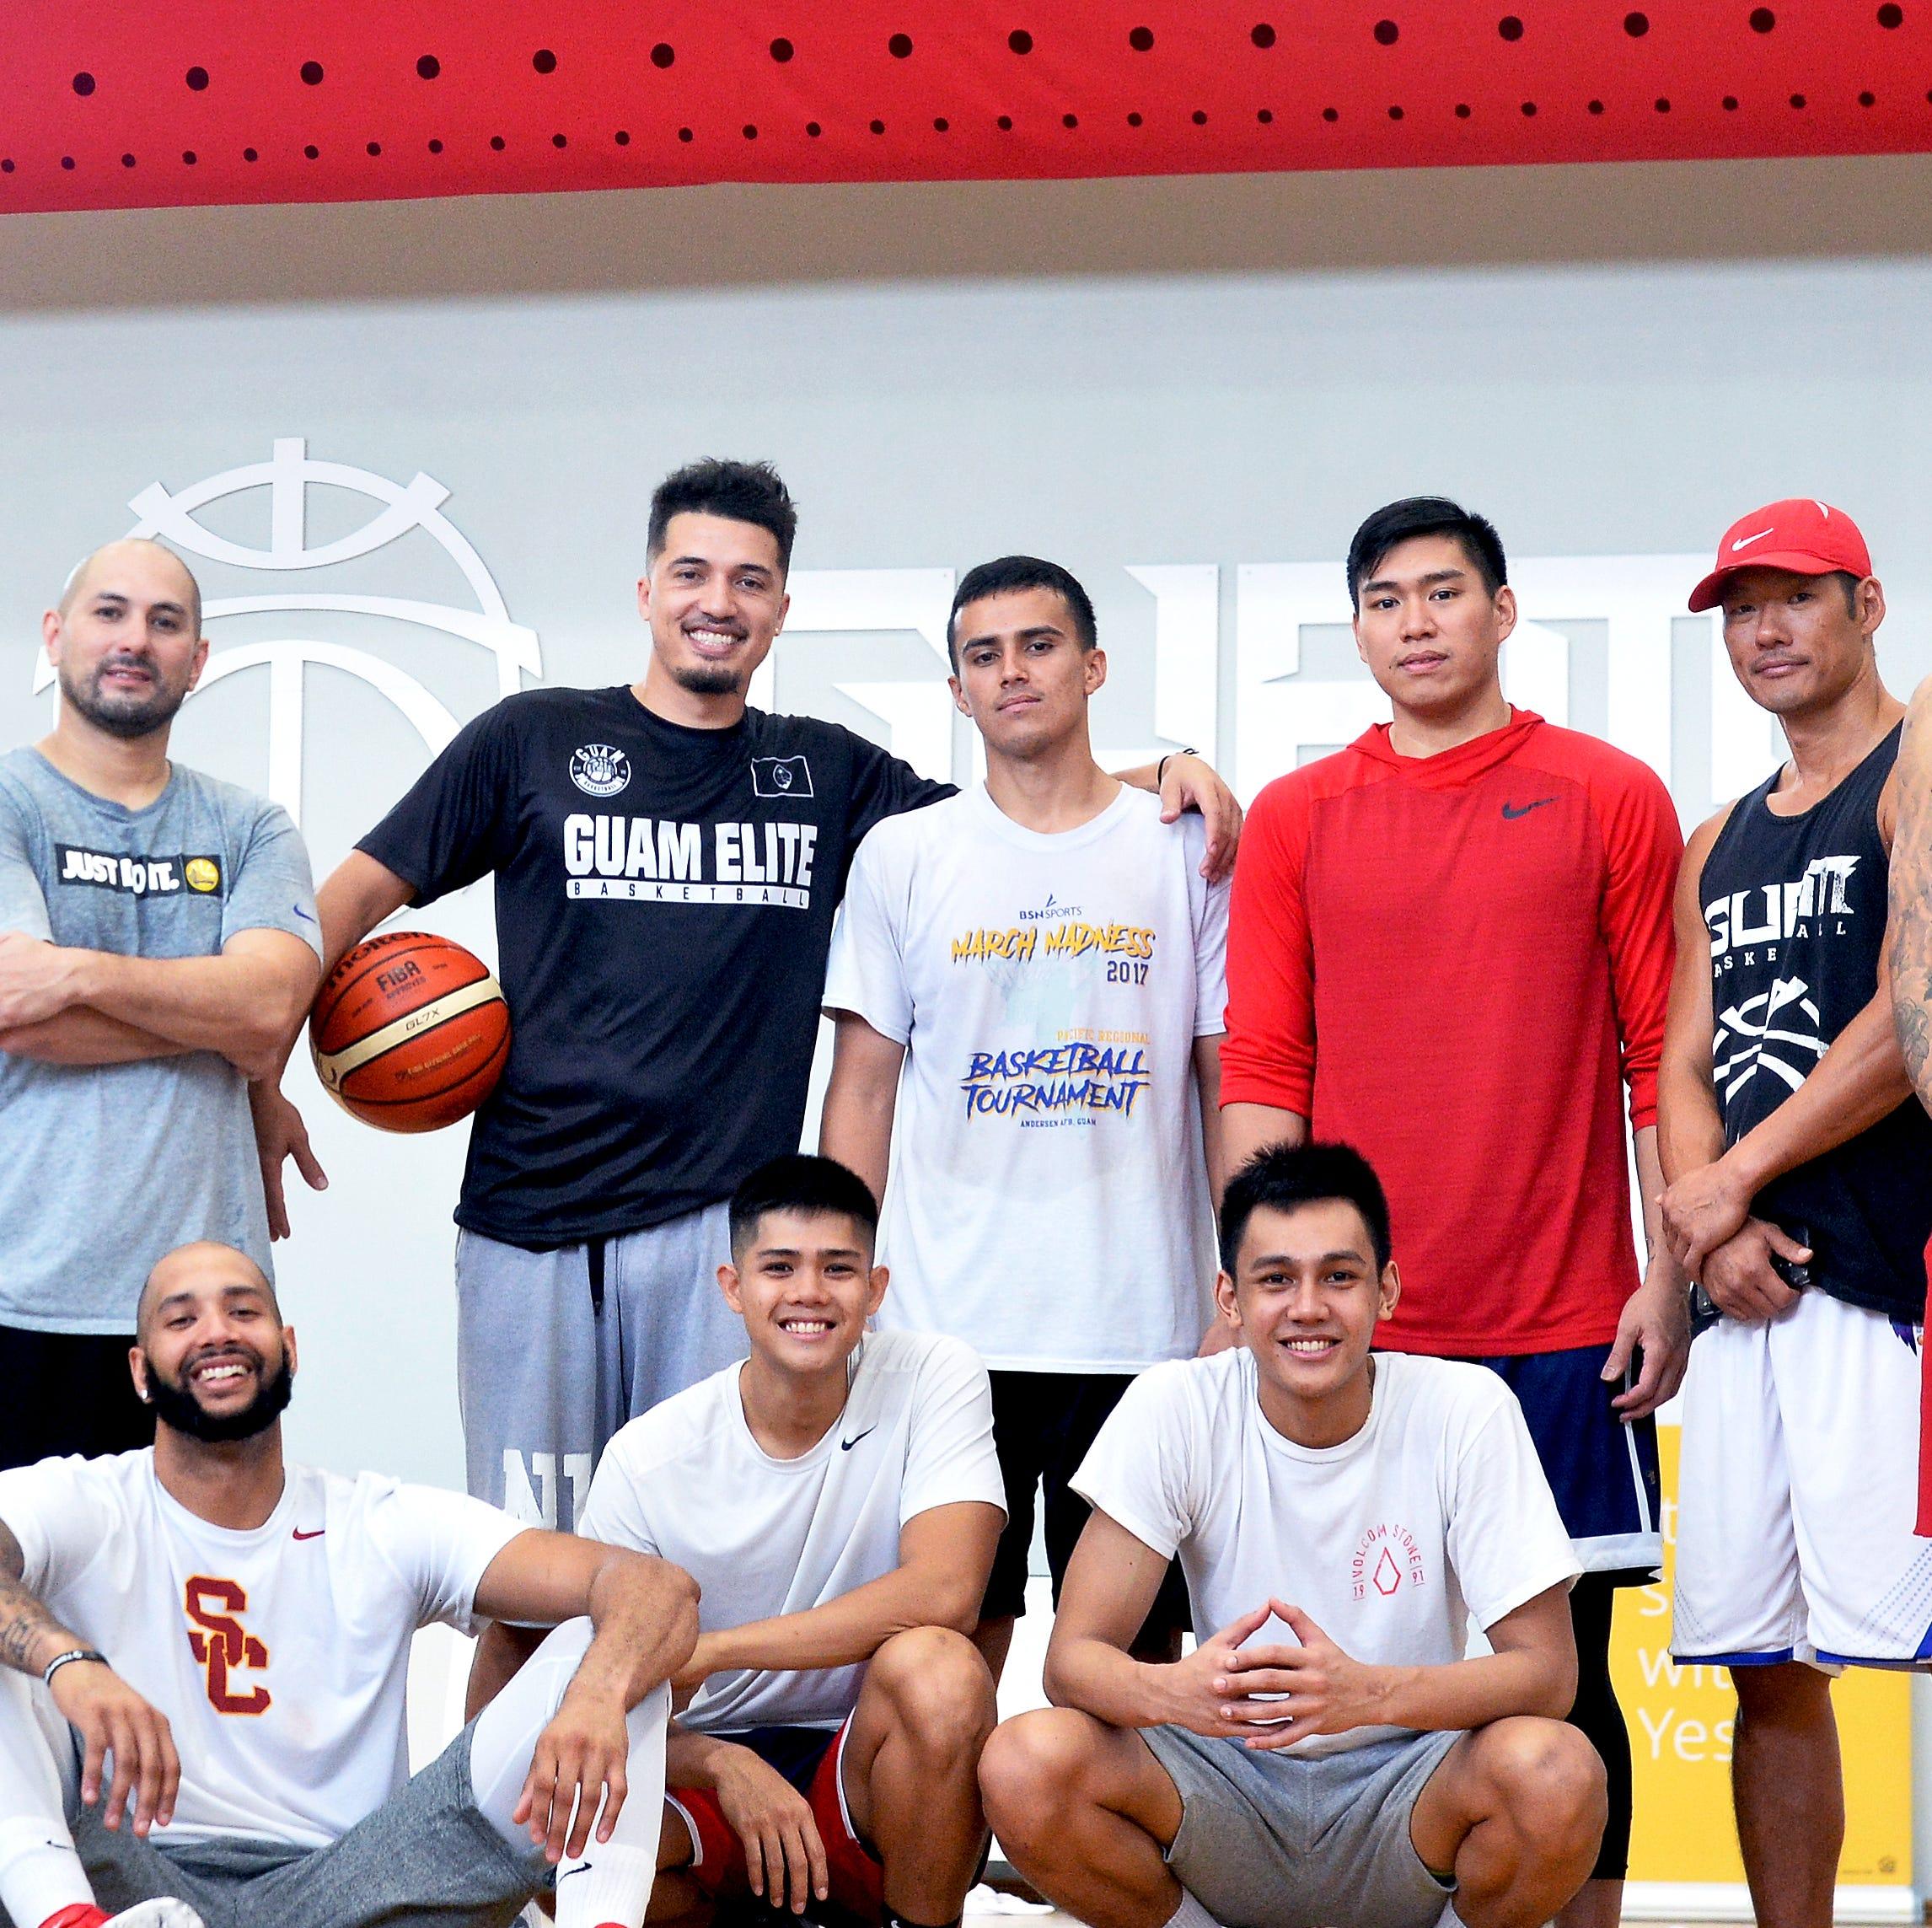 Team Guam faces historic FIBA challenge